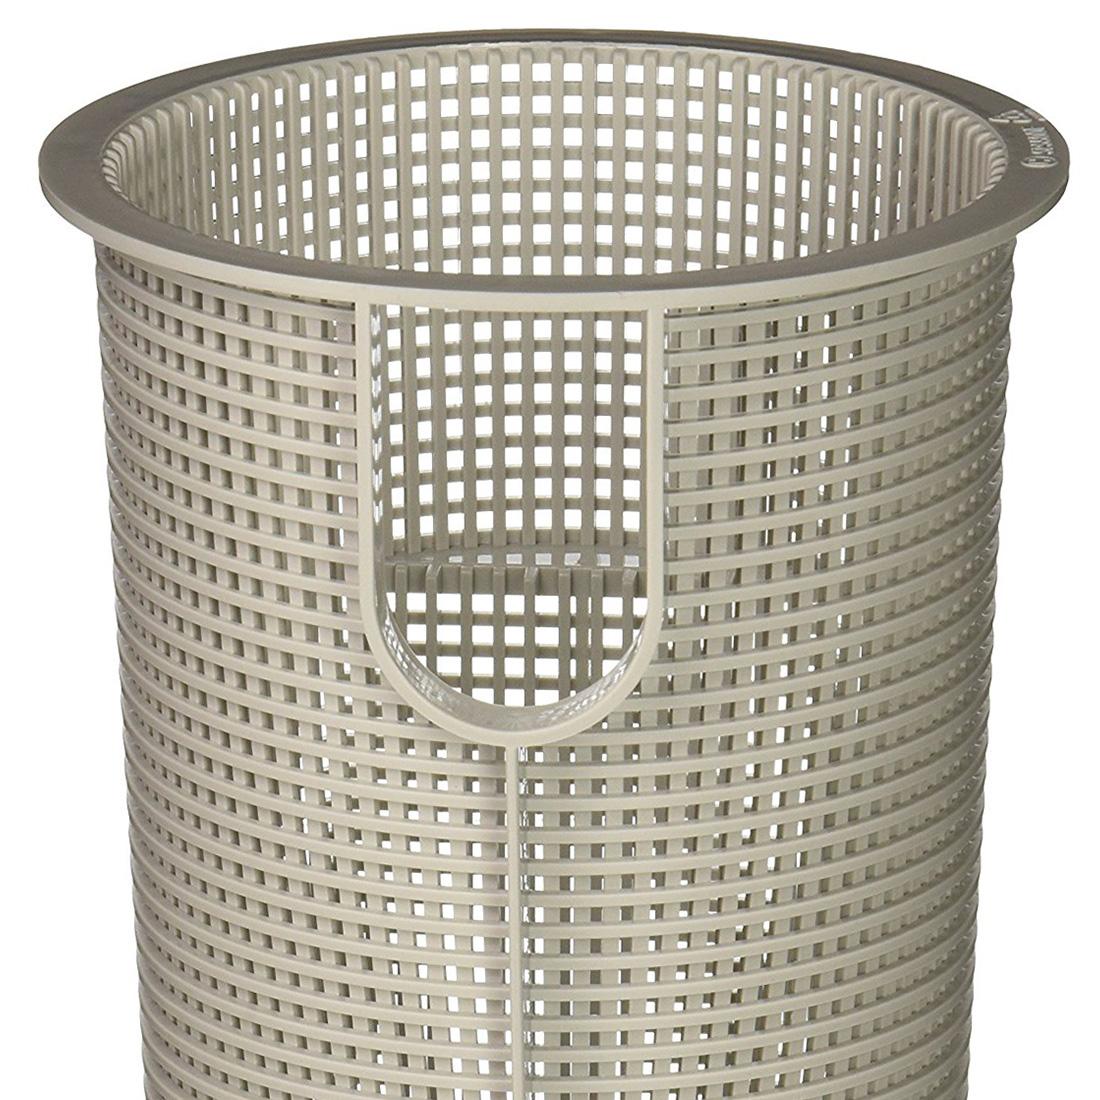 Hayward power flo strainer basket replacement for pool - Strainer basket for swimming pool ...